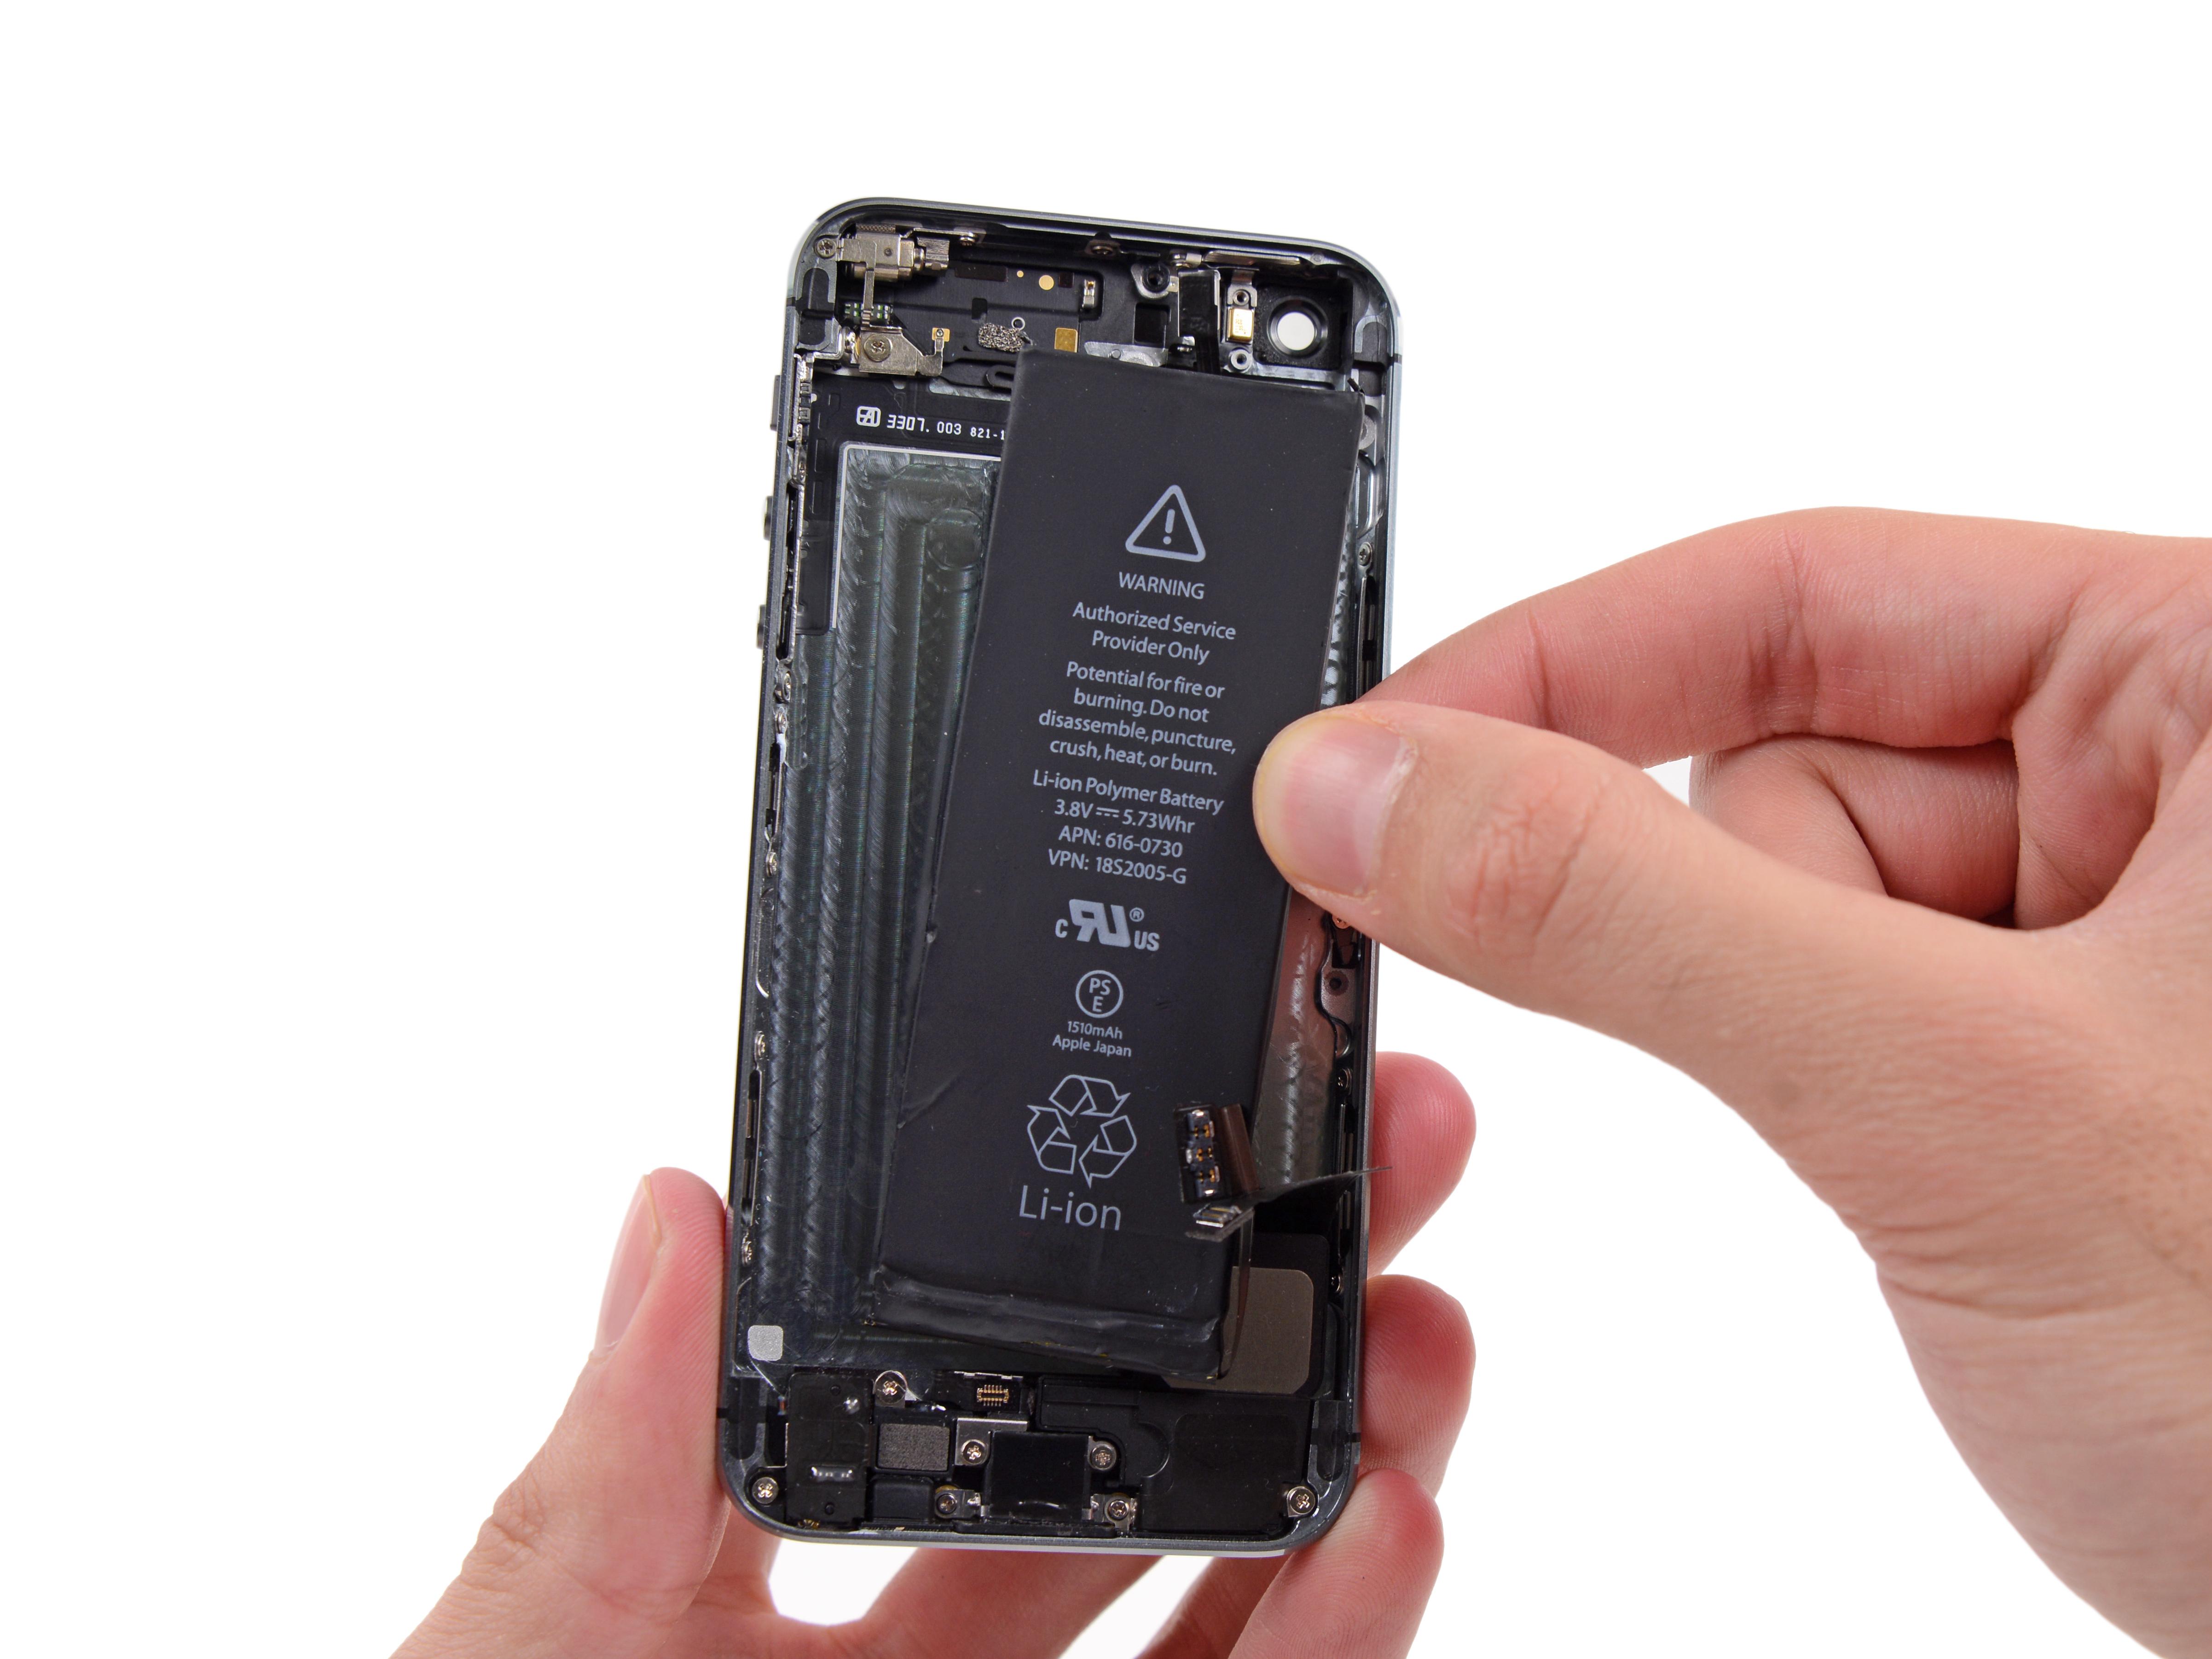 iPhone 5s Akku austauschen - iFixit